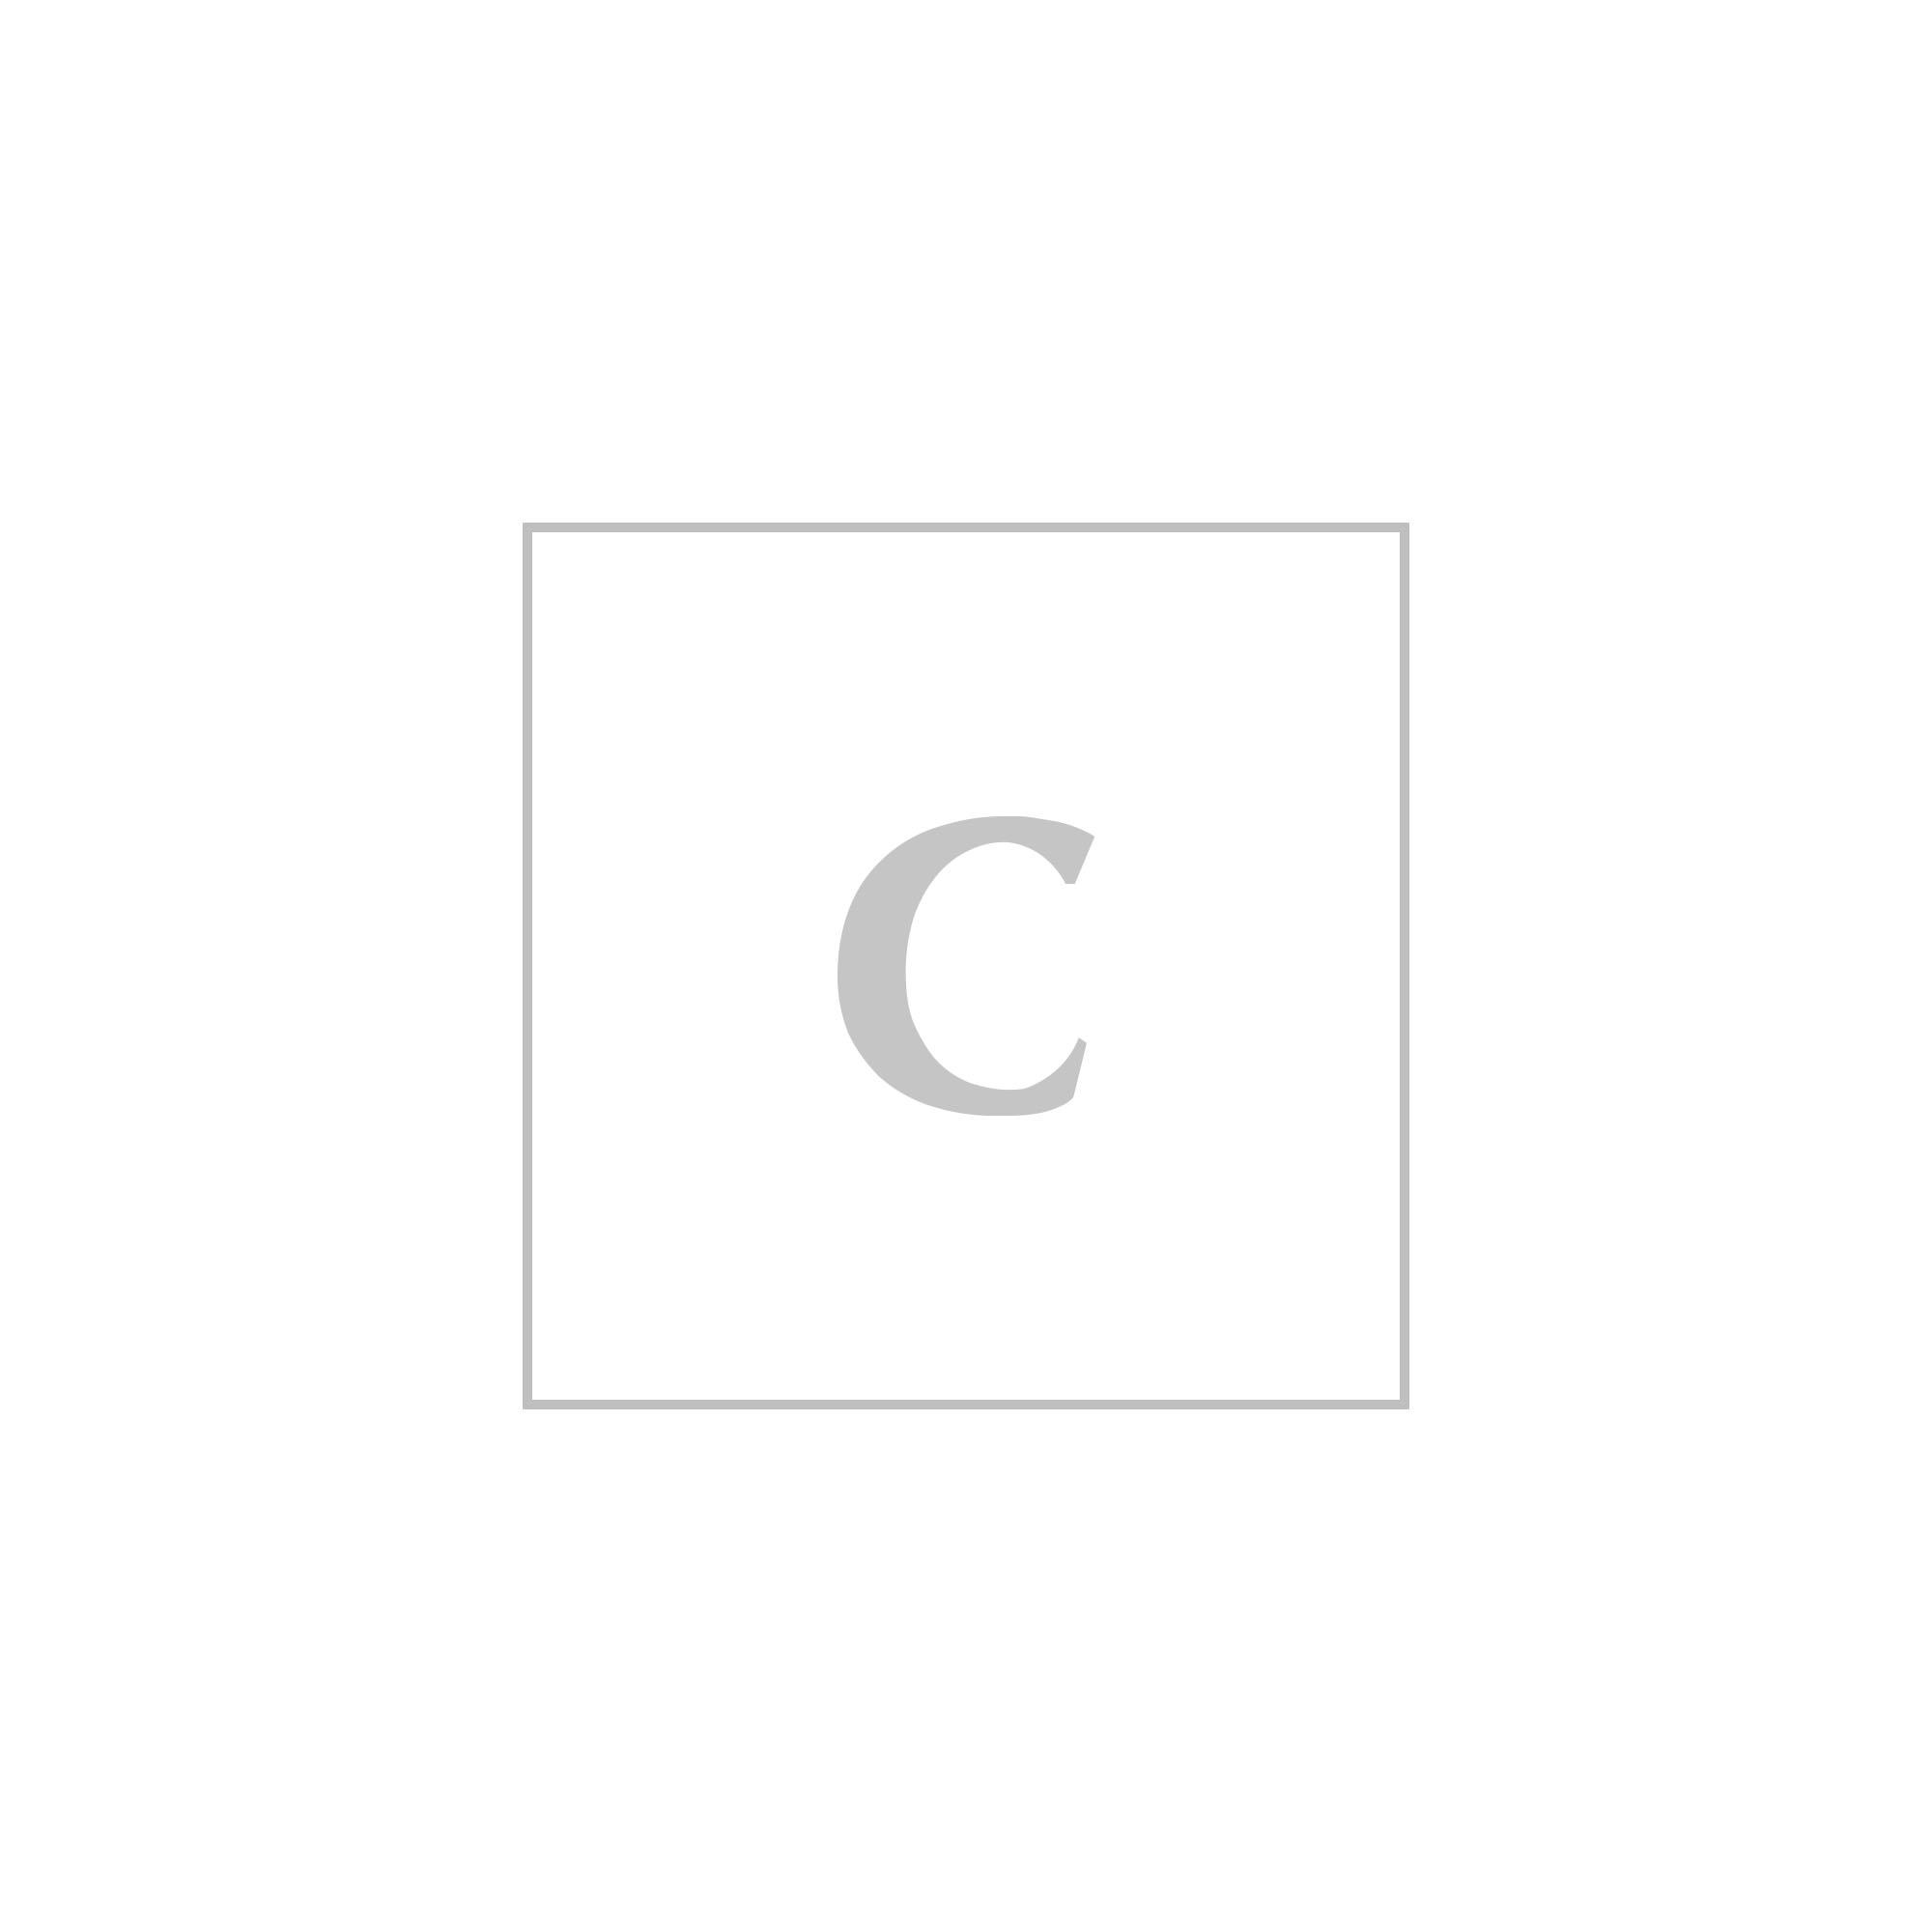 Miu miu crystal logo cardholder